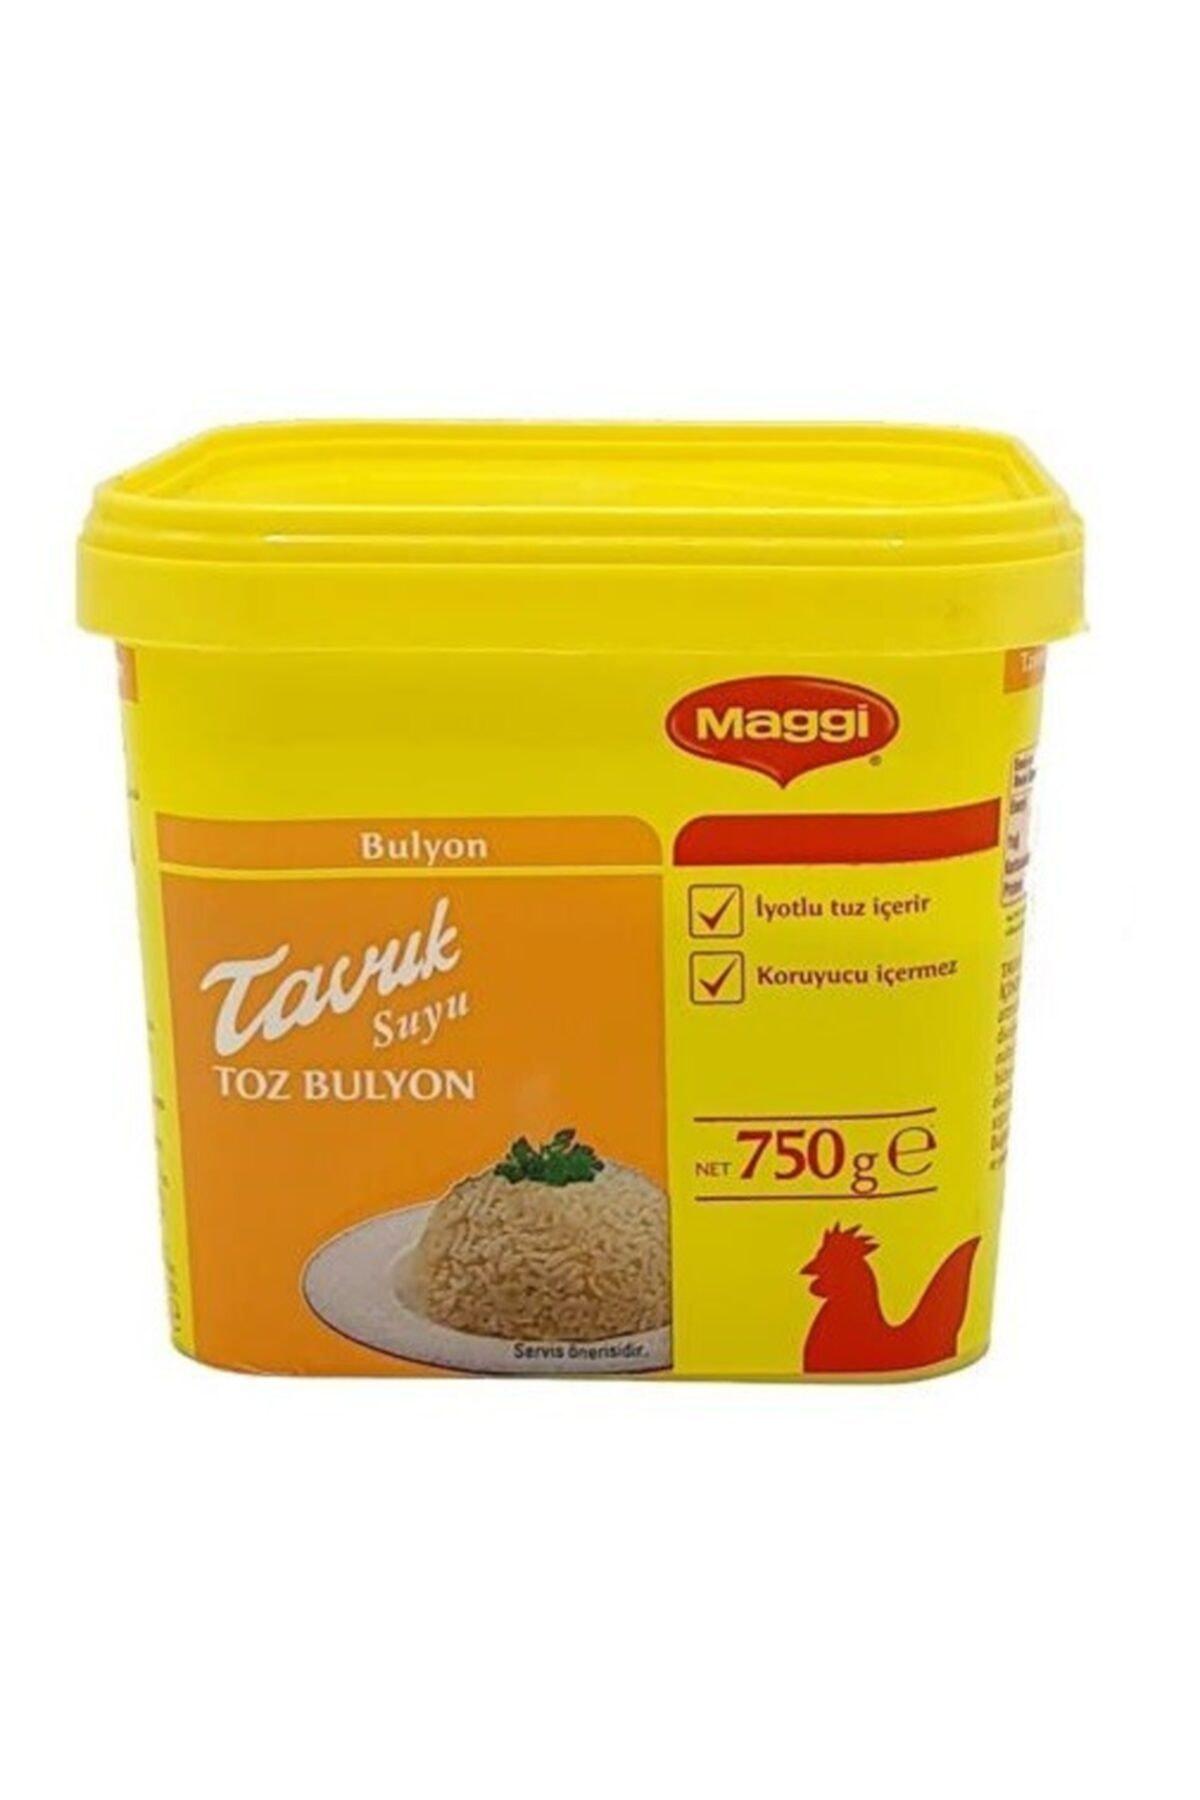 Maggi Nestle Tavuk Bulyon 750g 1